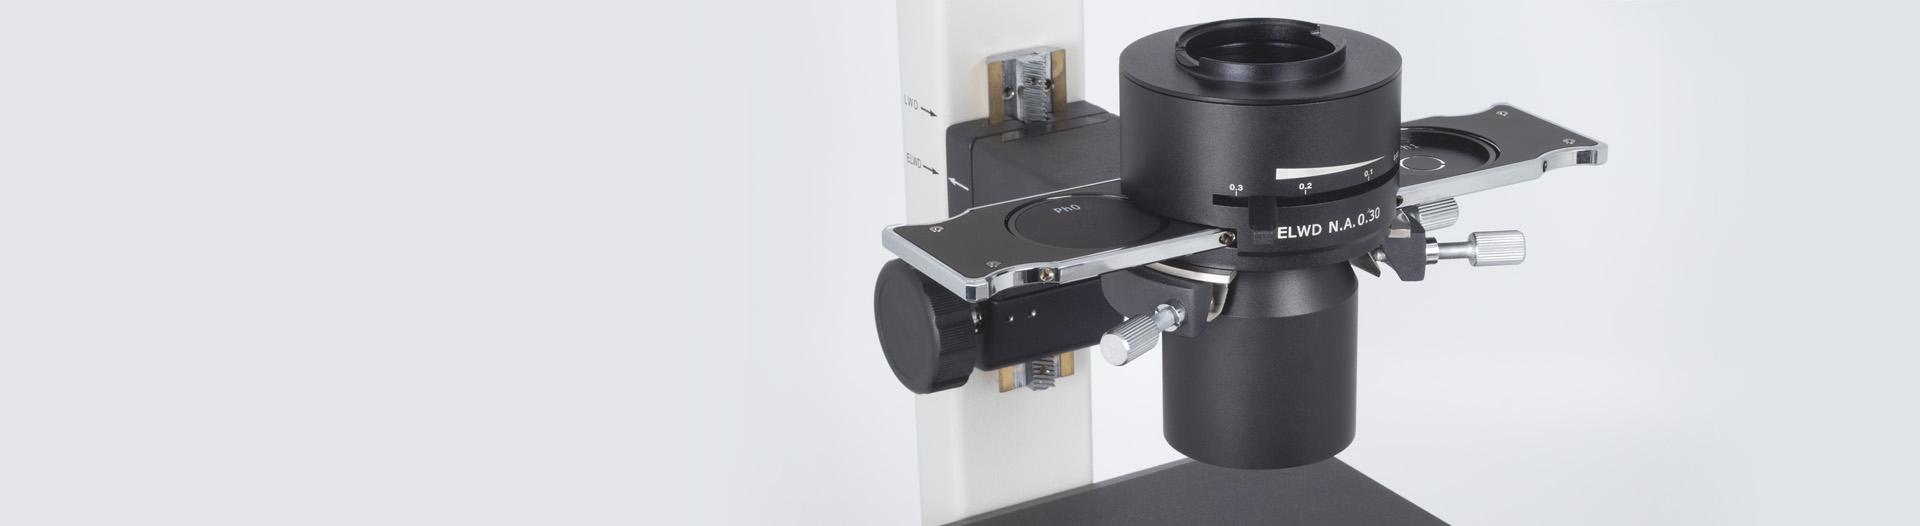 AE31E inverted microscope phase contrast